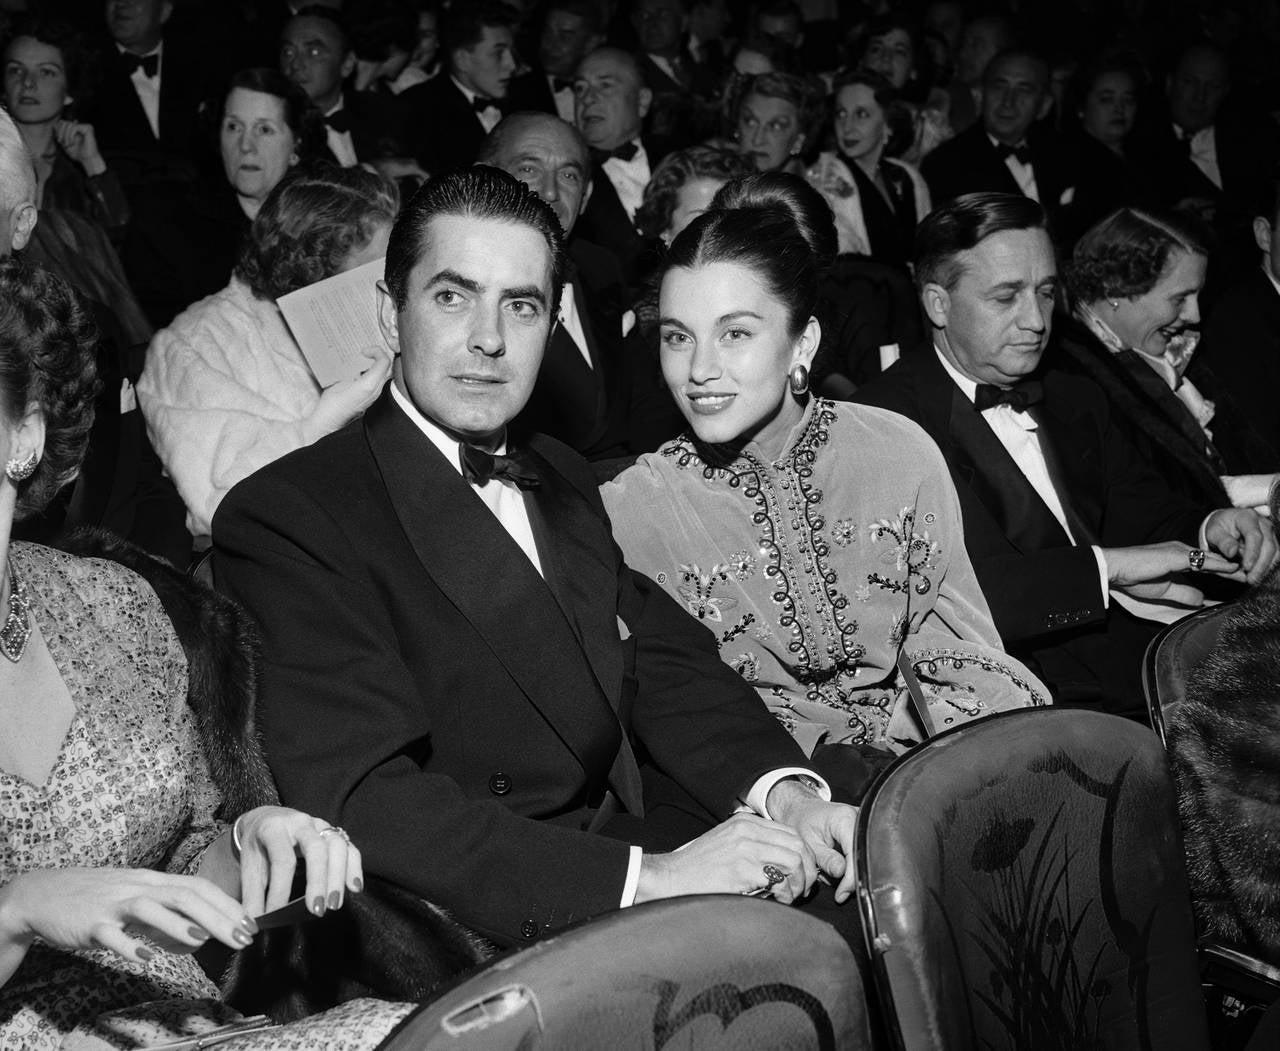 Frank Worth Tyrone Power And Linda Christian 1949